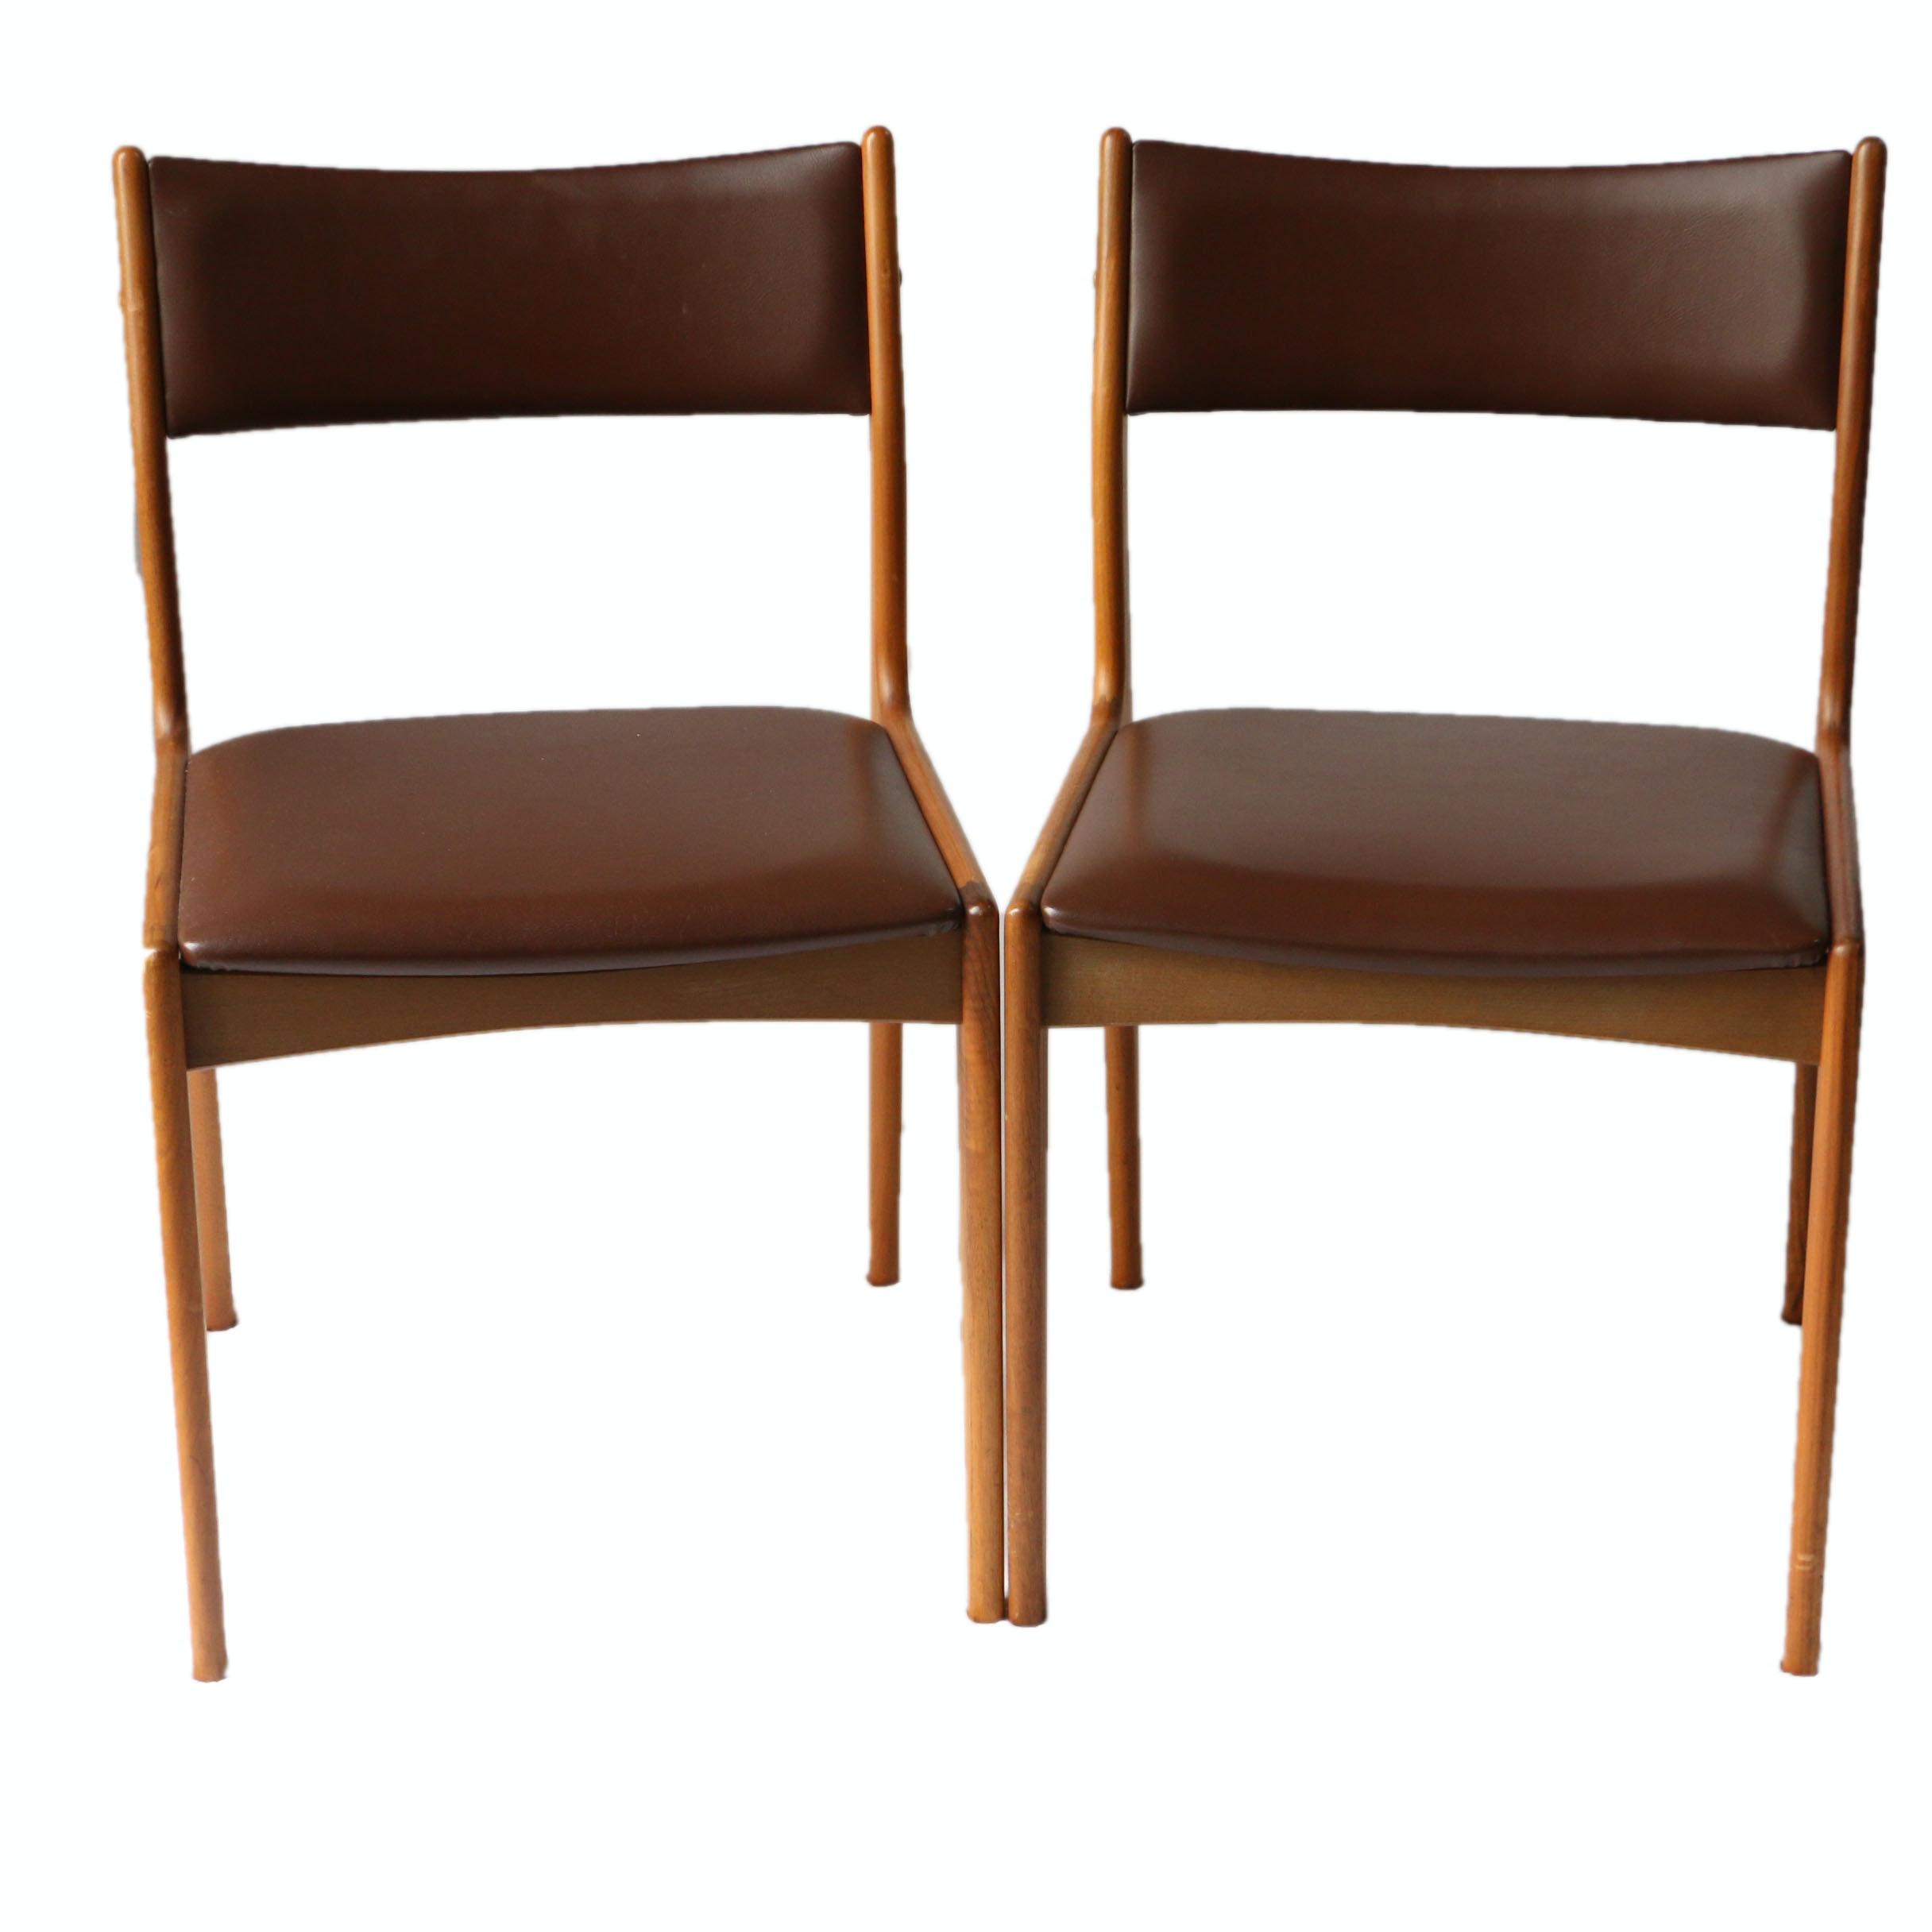 Danish Modern Teak Dining Chairs by Johannes Andersen for Uldum Møbelfabrik